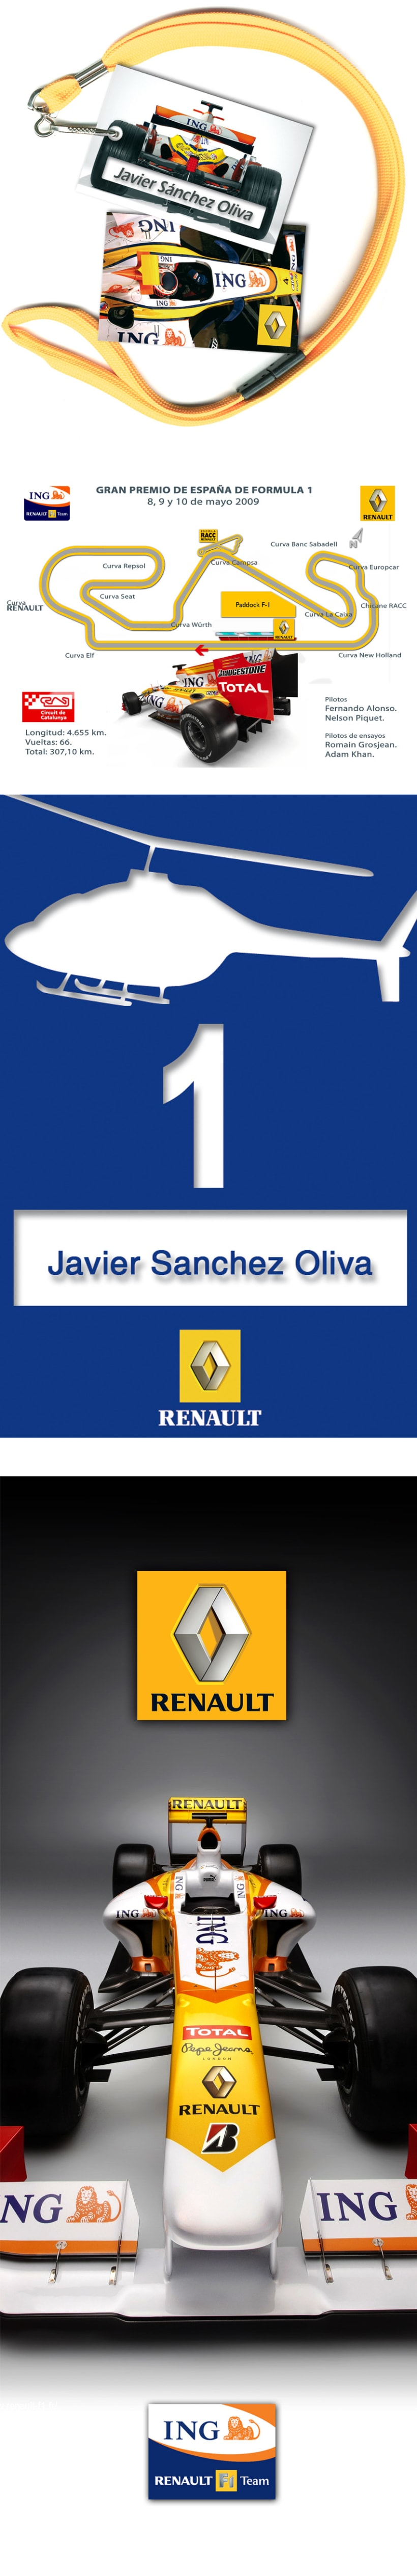 Renault Gran Premio de Montmeló 2